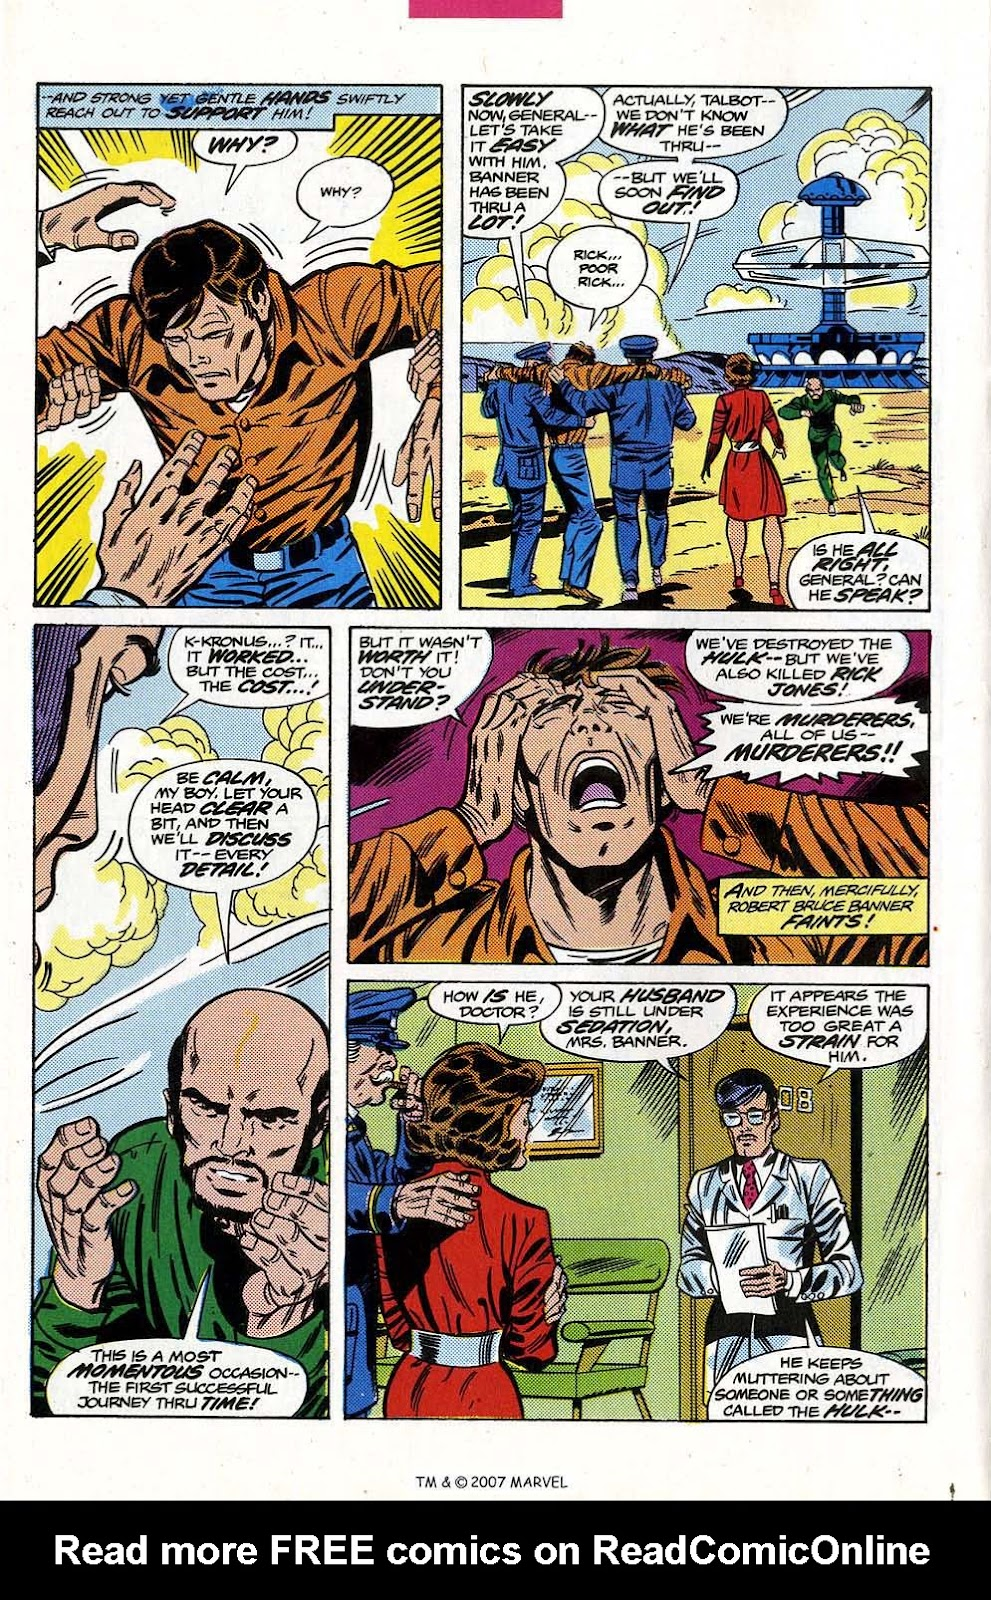 Comic The Incredible Hulk (2000) issue 22